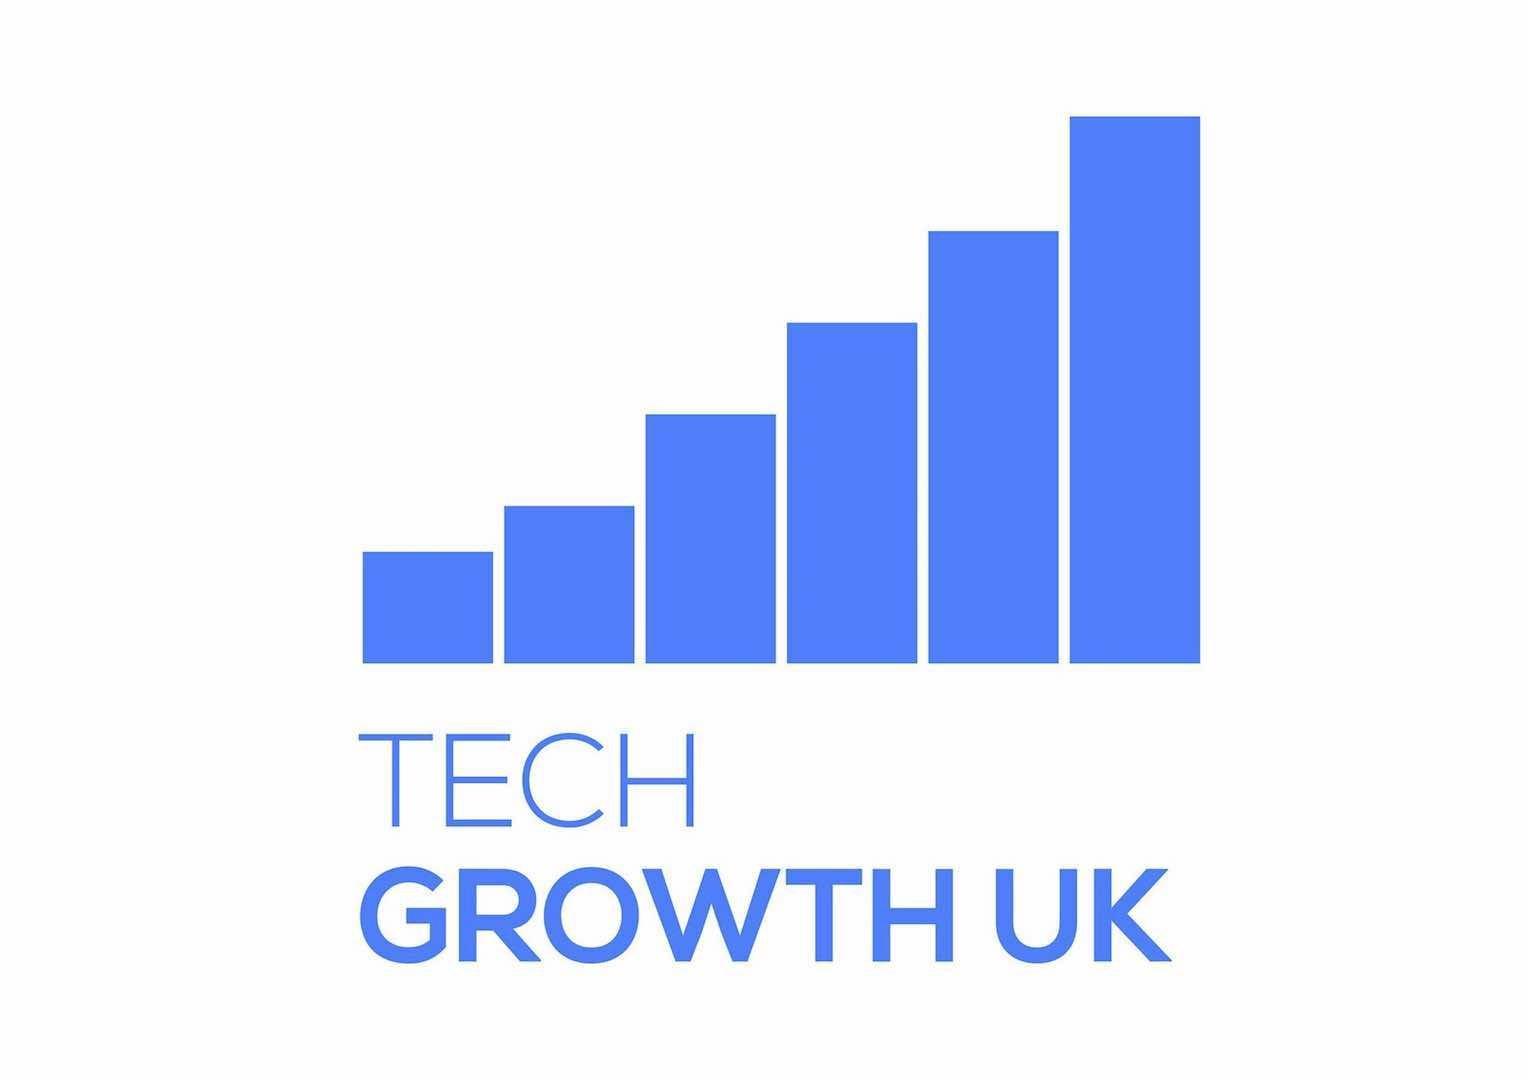 Tech Growth UK